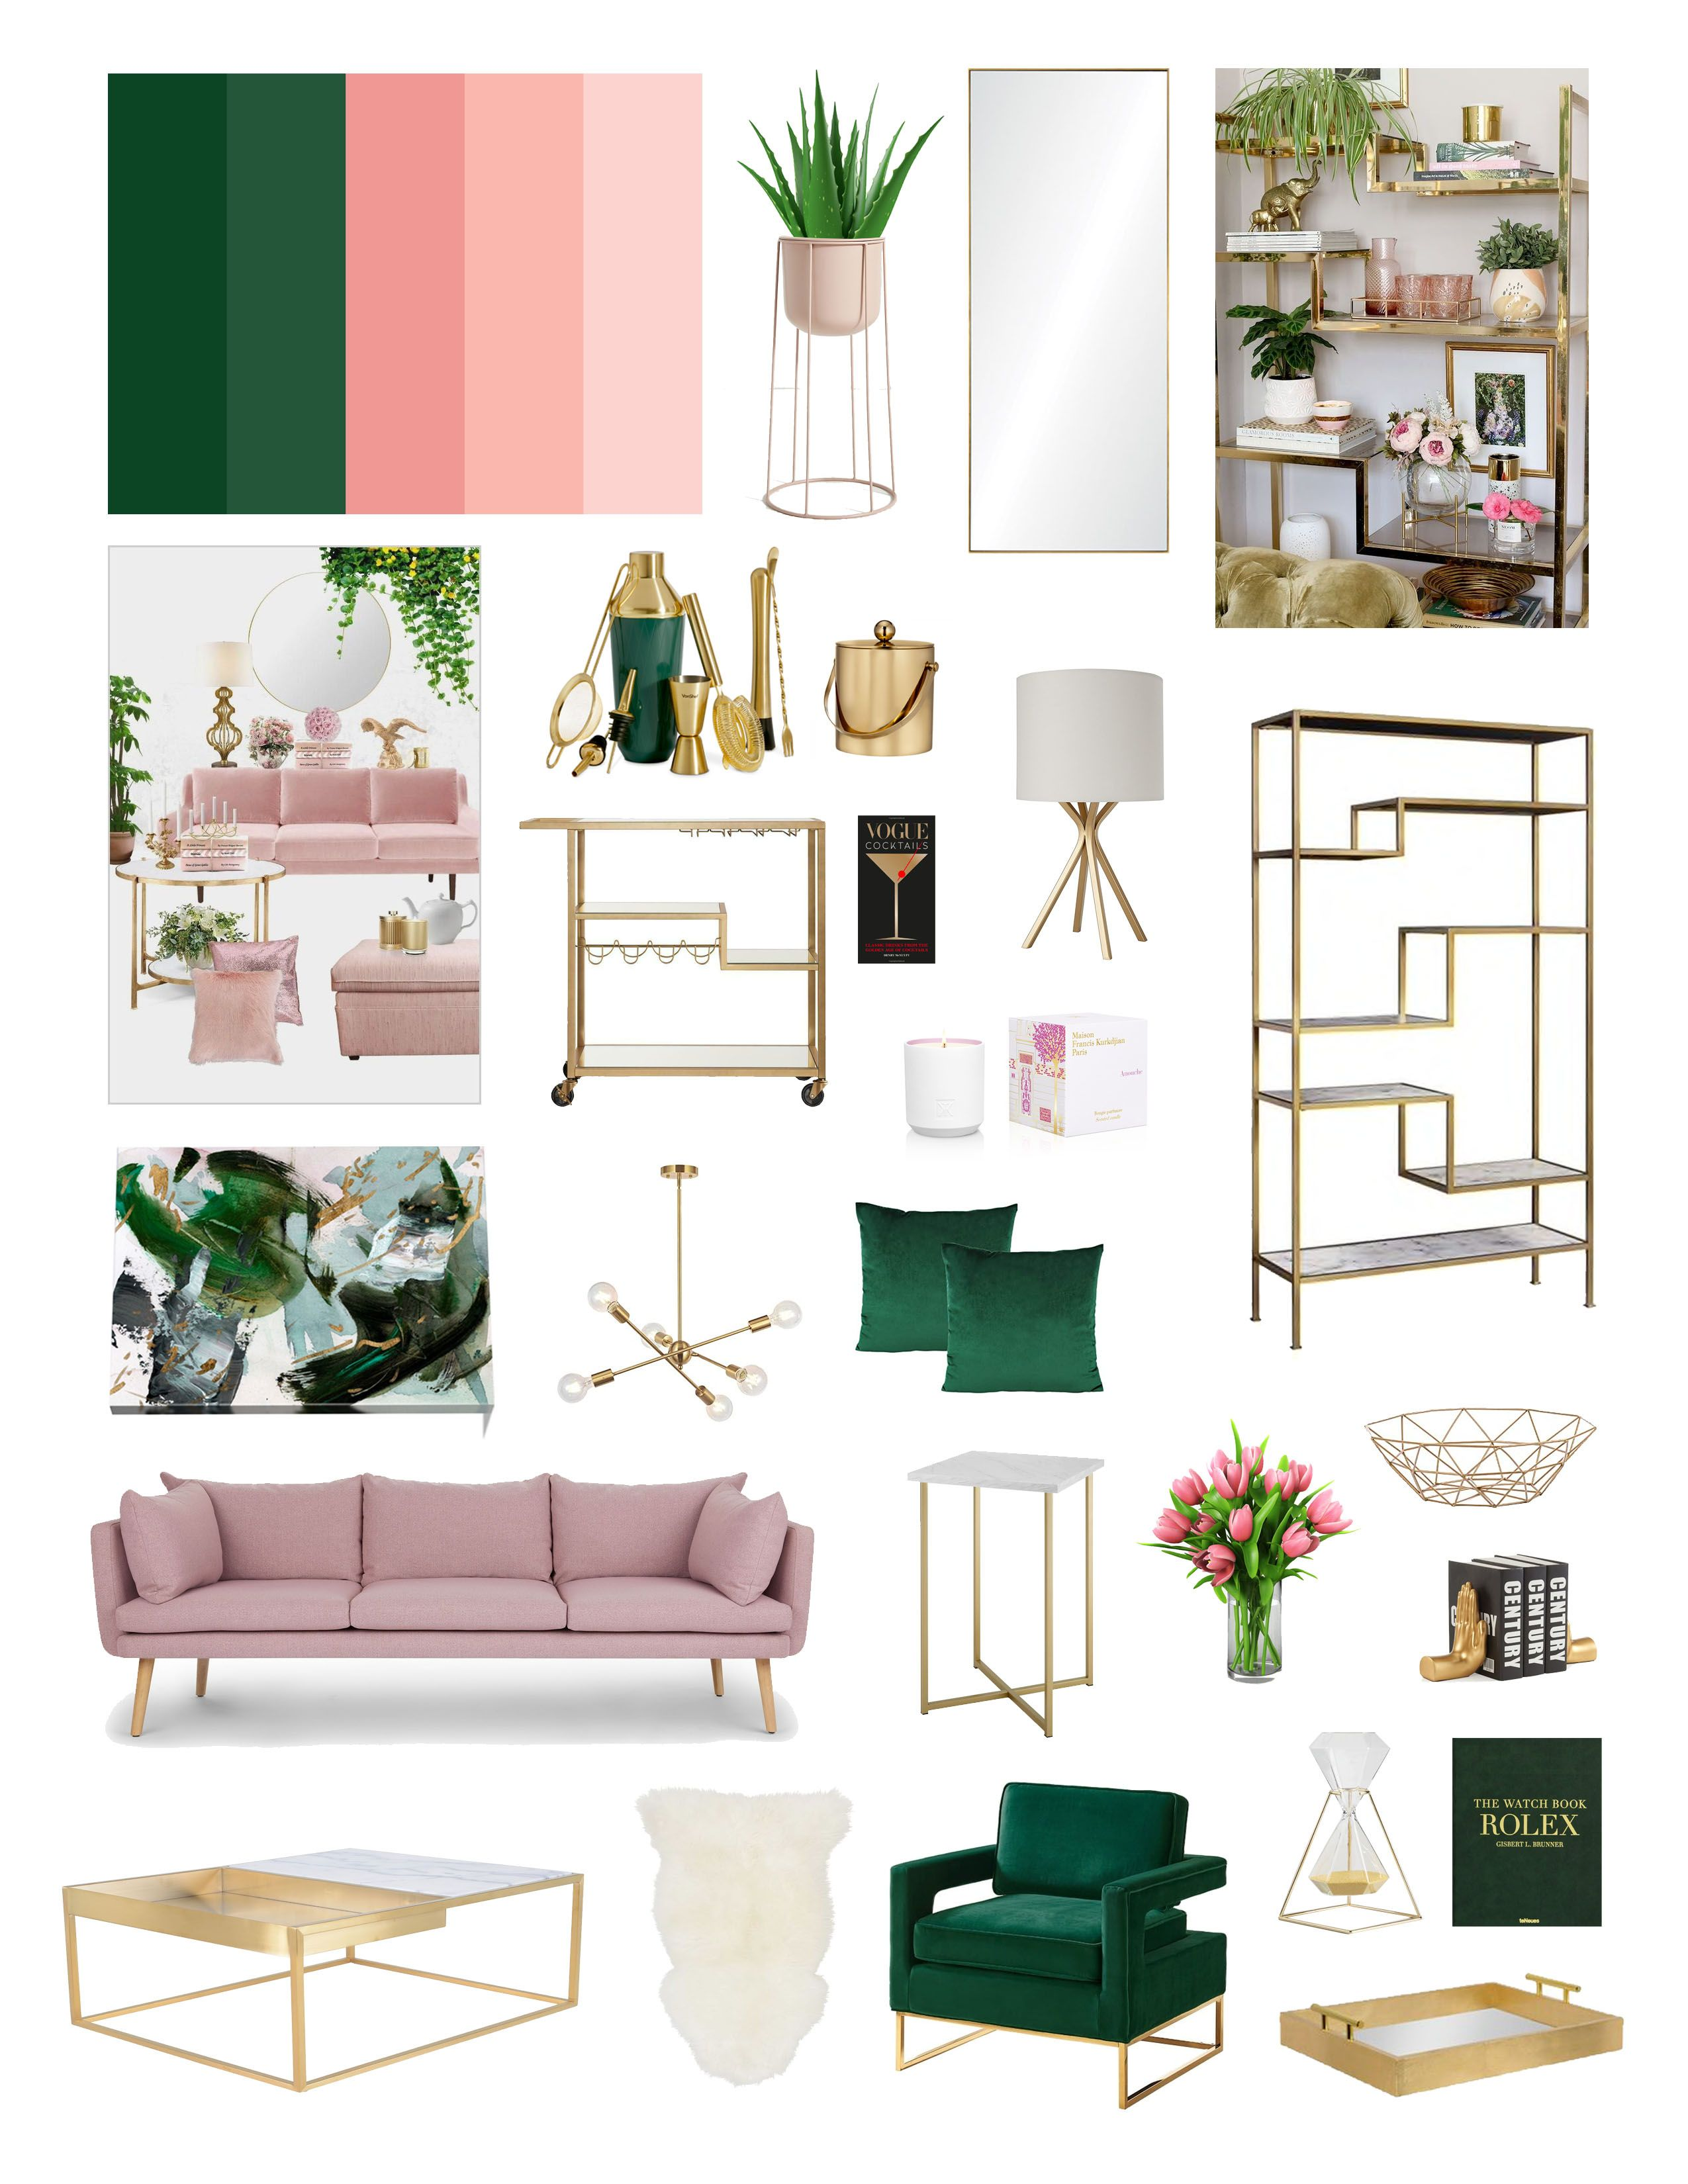 Pink Green Living Room Mood Board In 2020 Living Room Green Emerald Green Living Room Green Rooms